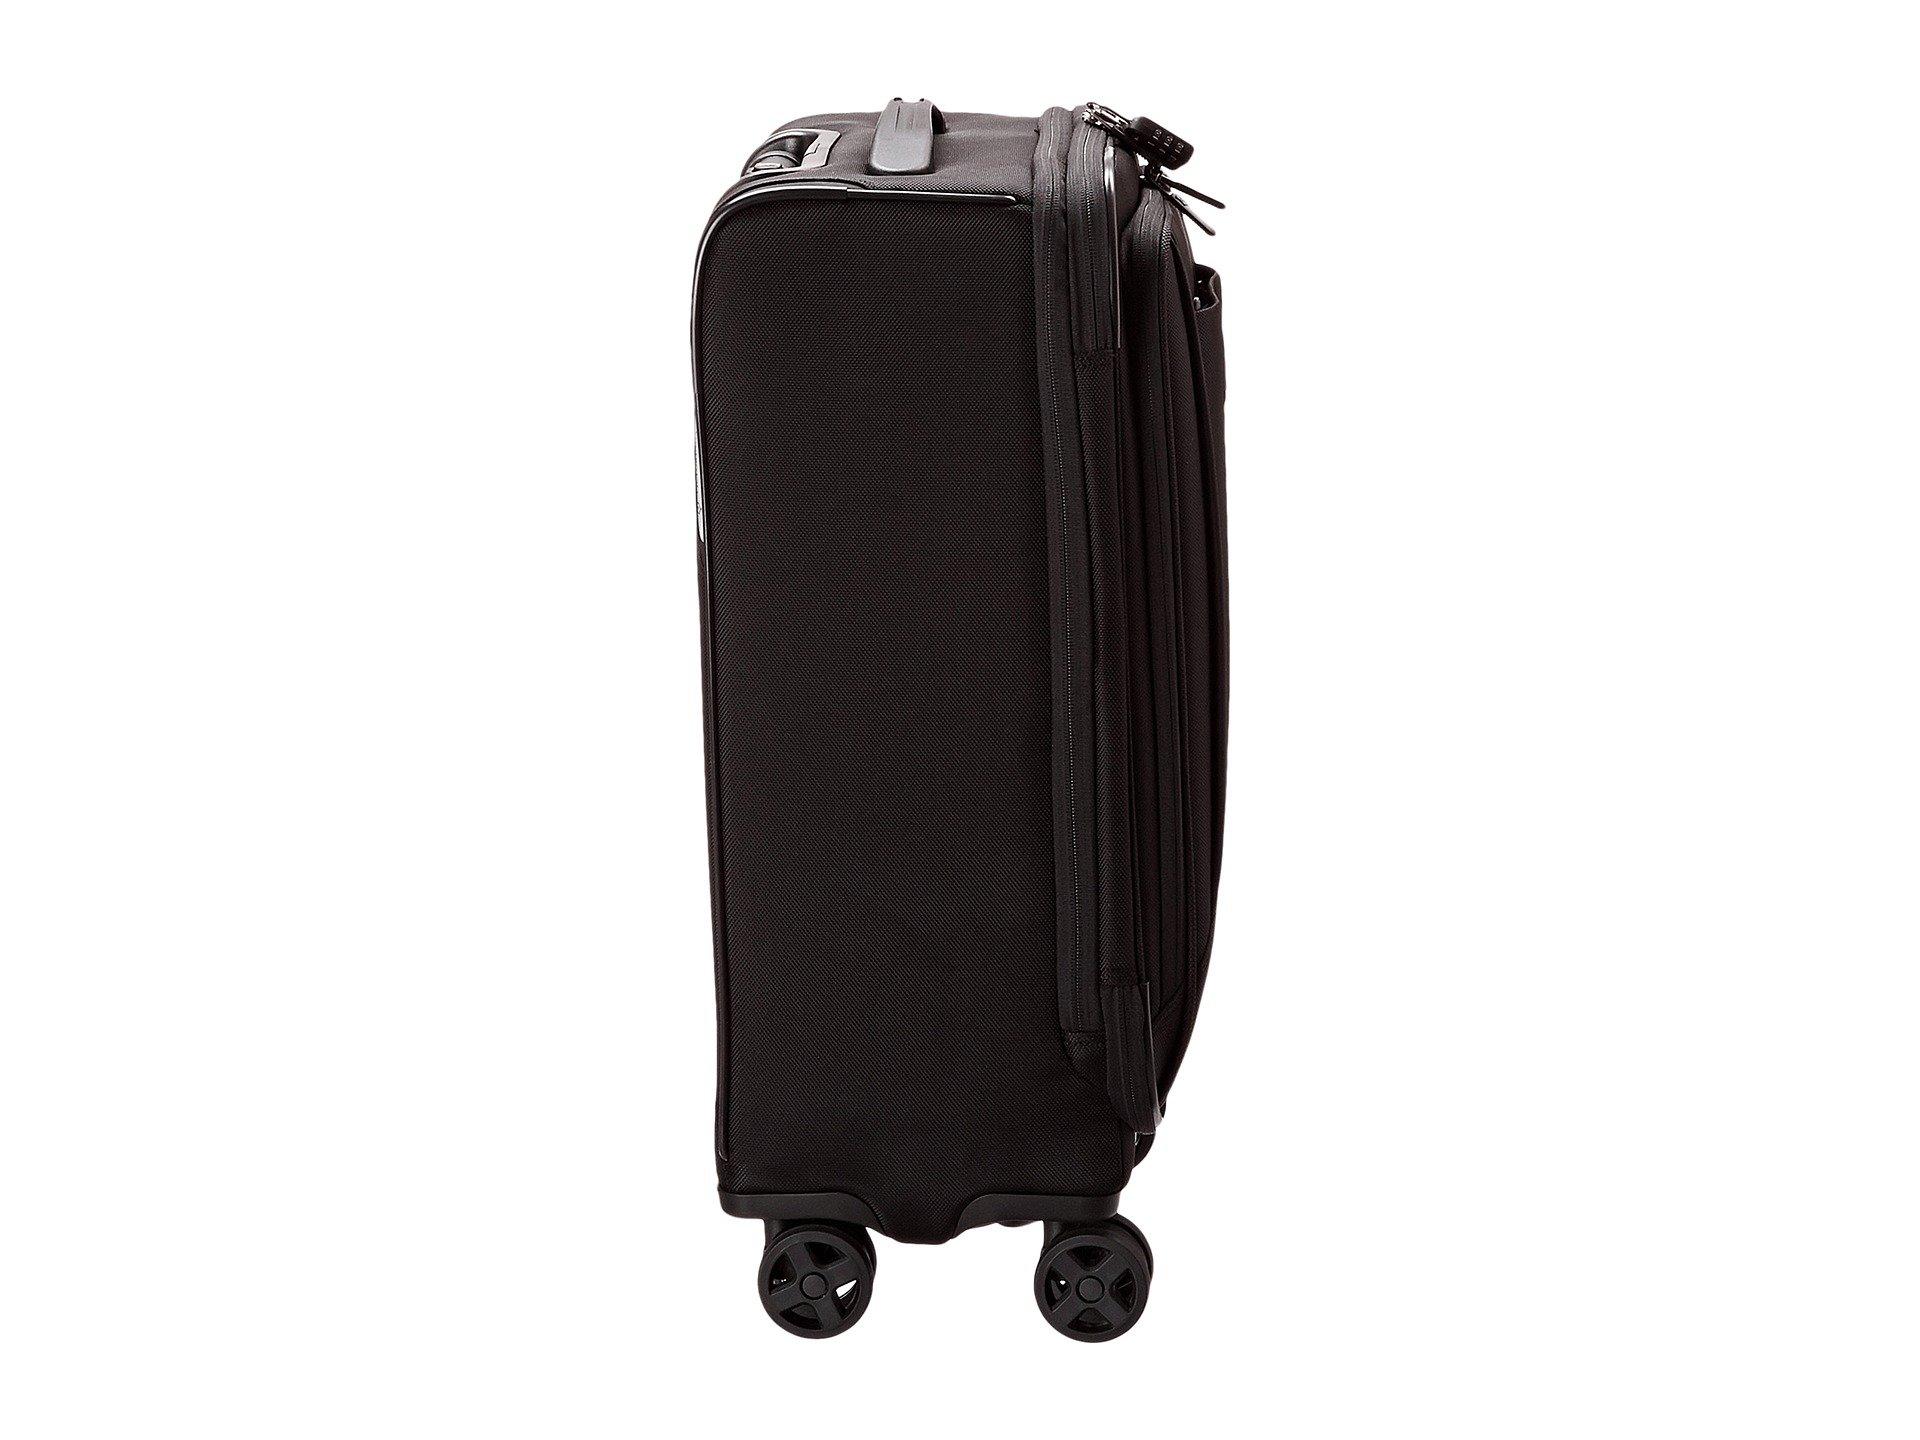 Dual Caster Black Wt Expandable on 5 Traveler Werks 22